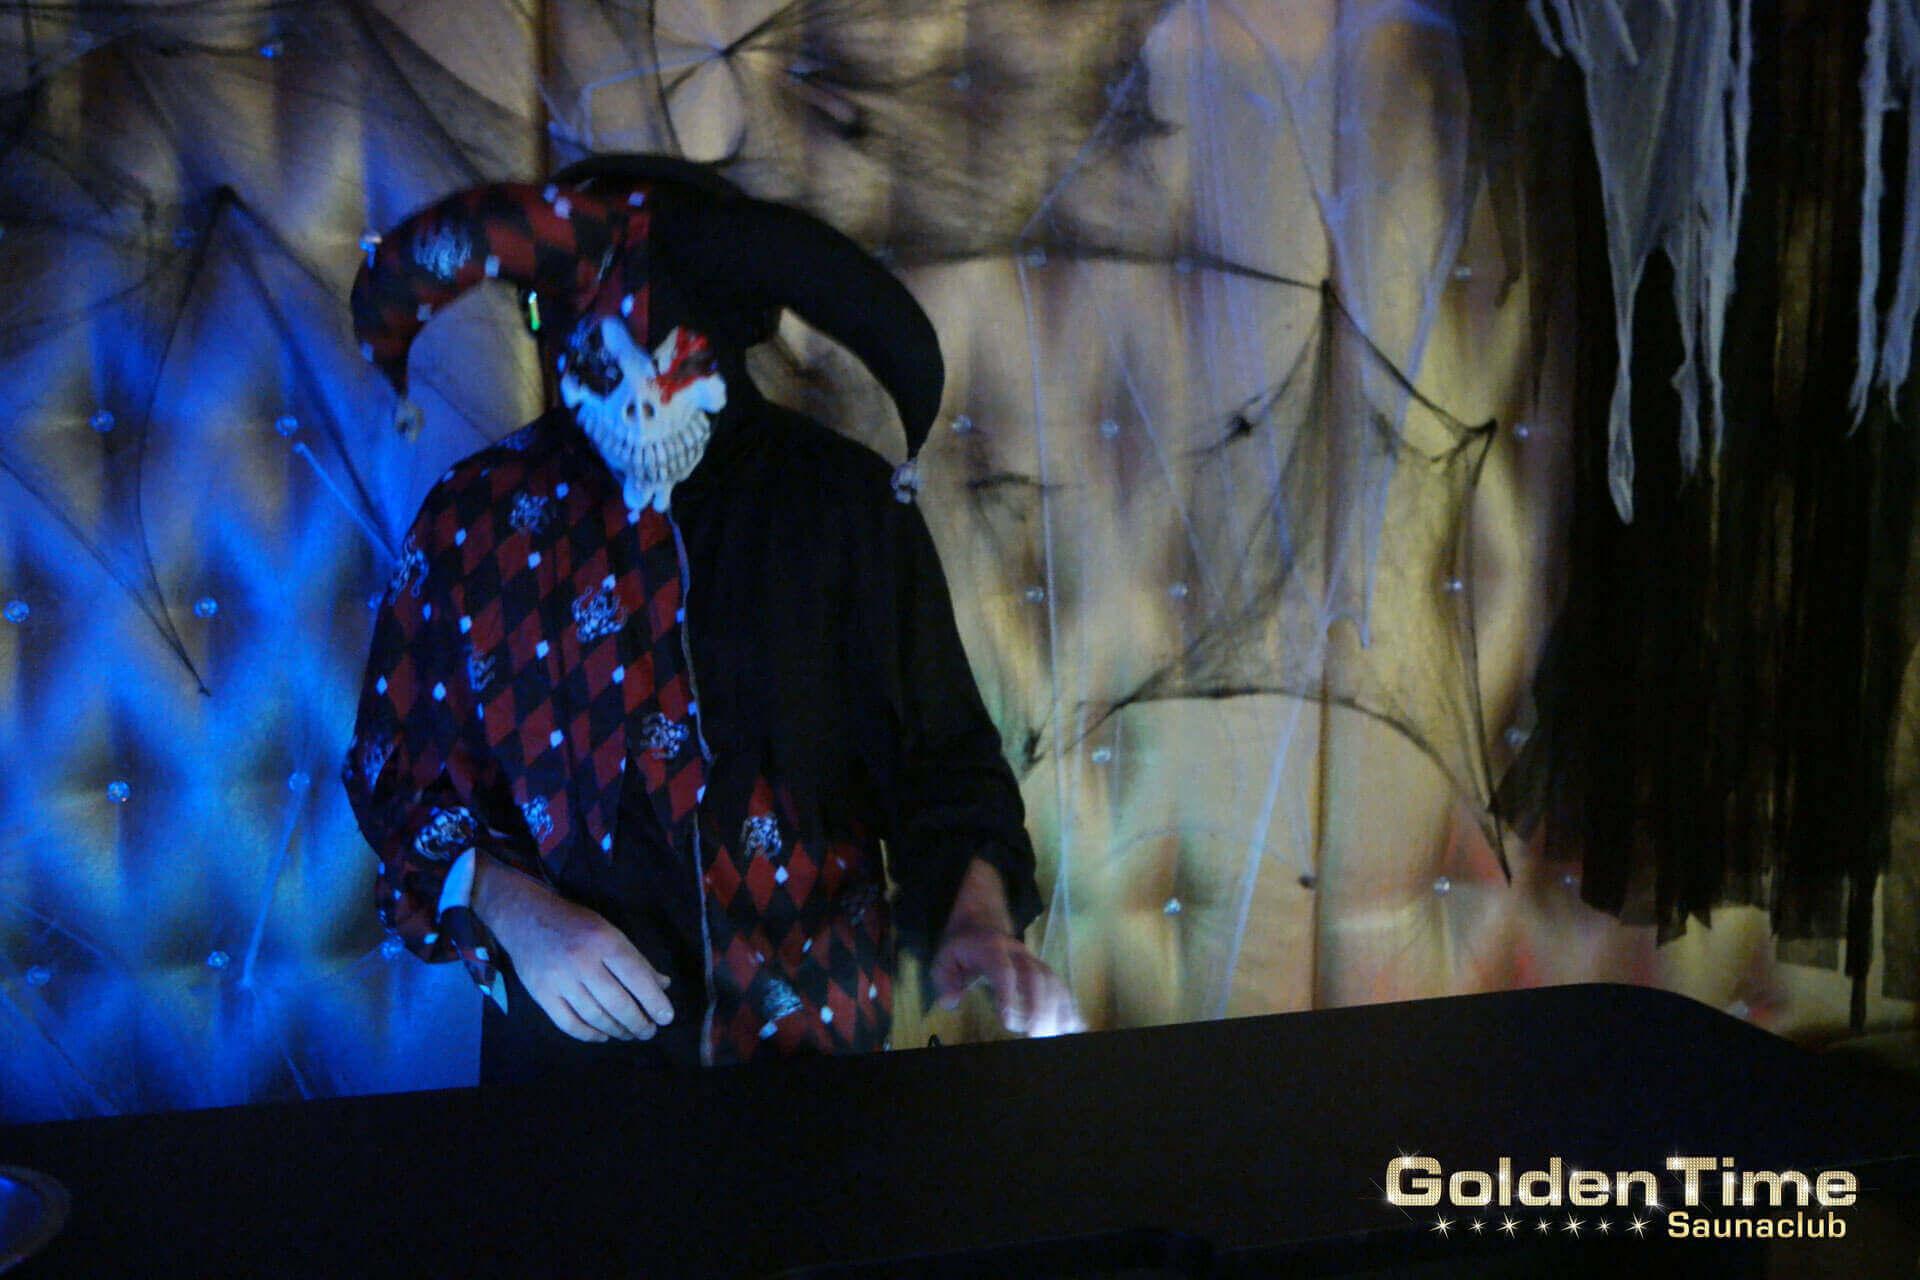 03-halloween-2016-goldentime-saunaclub-30.jpg